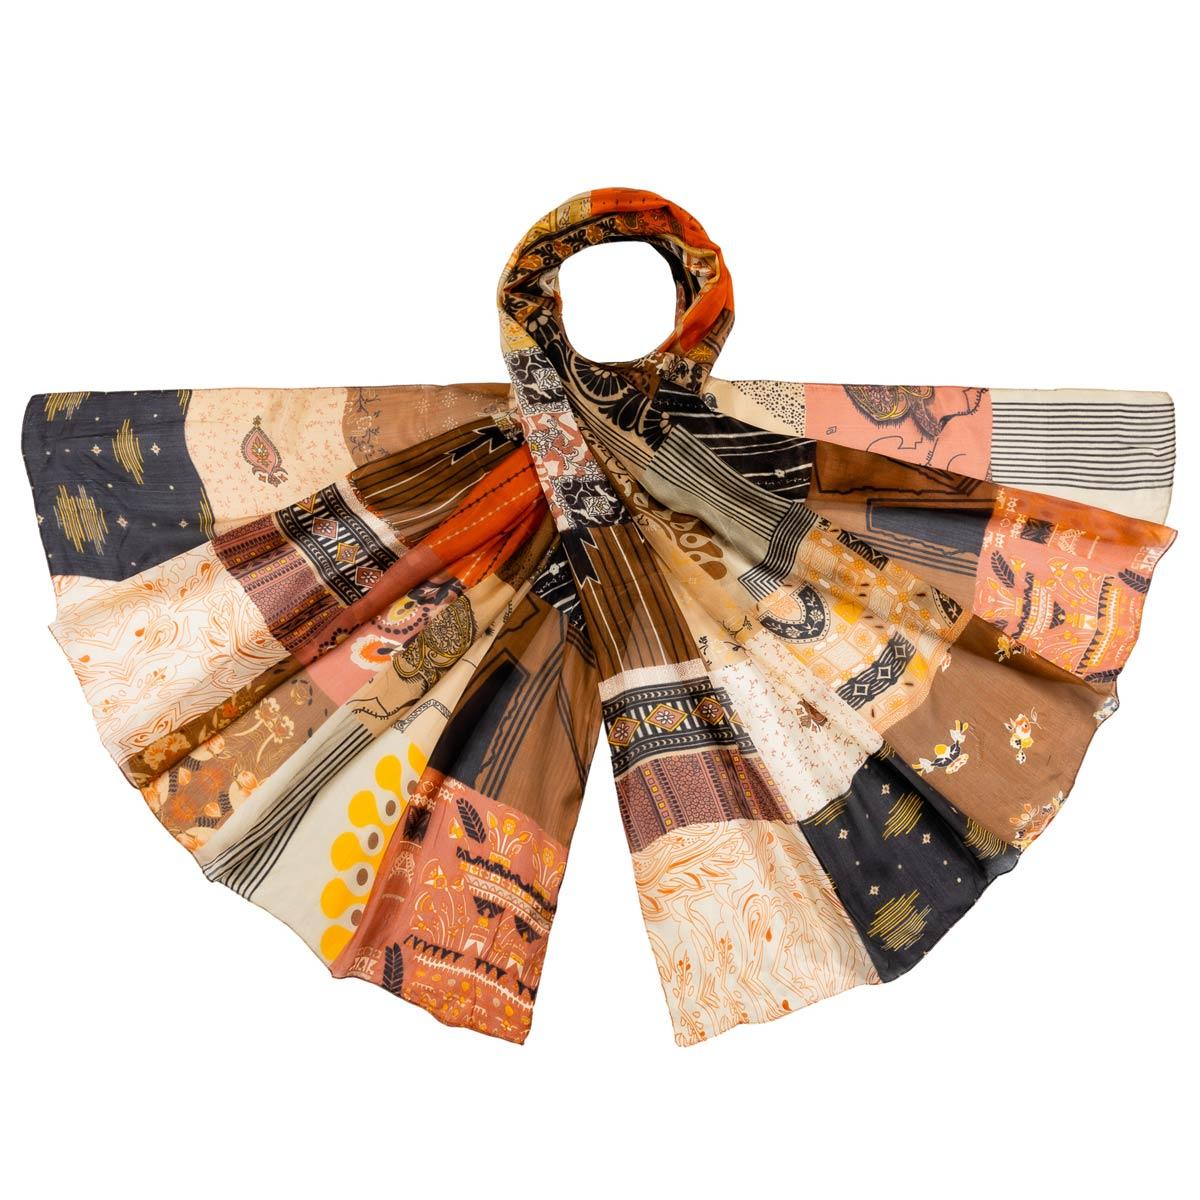 AT-06350-F12-etole-legere-marron-patchwork